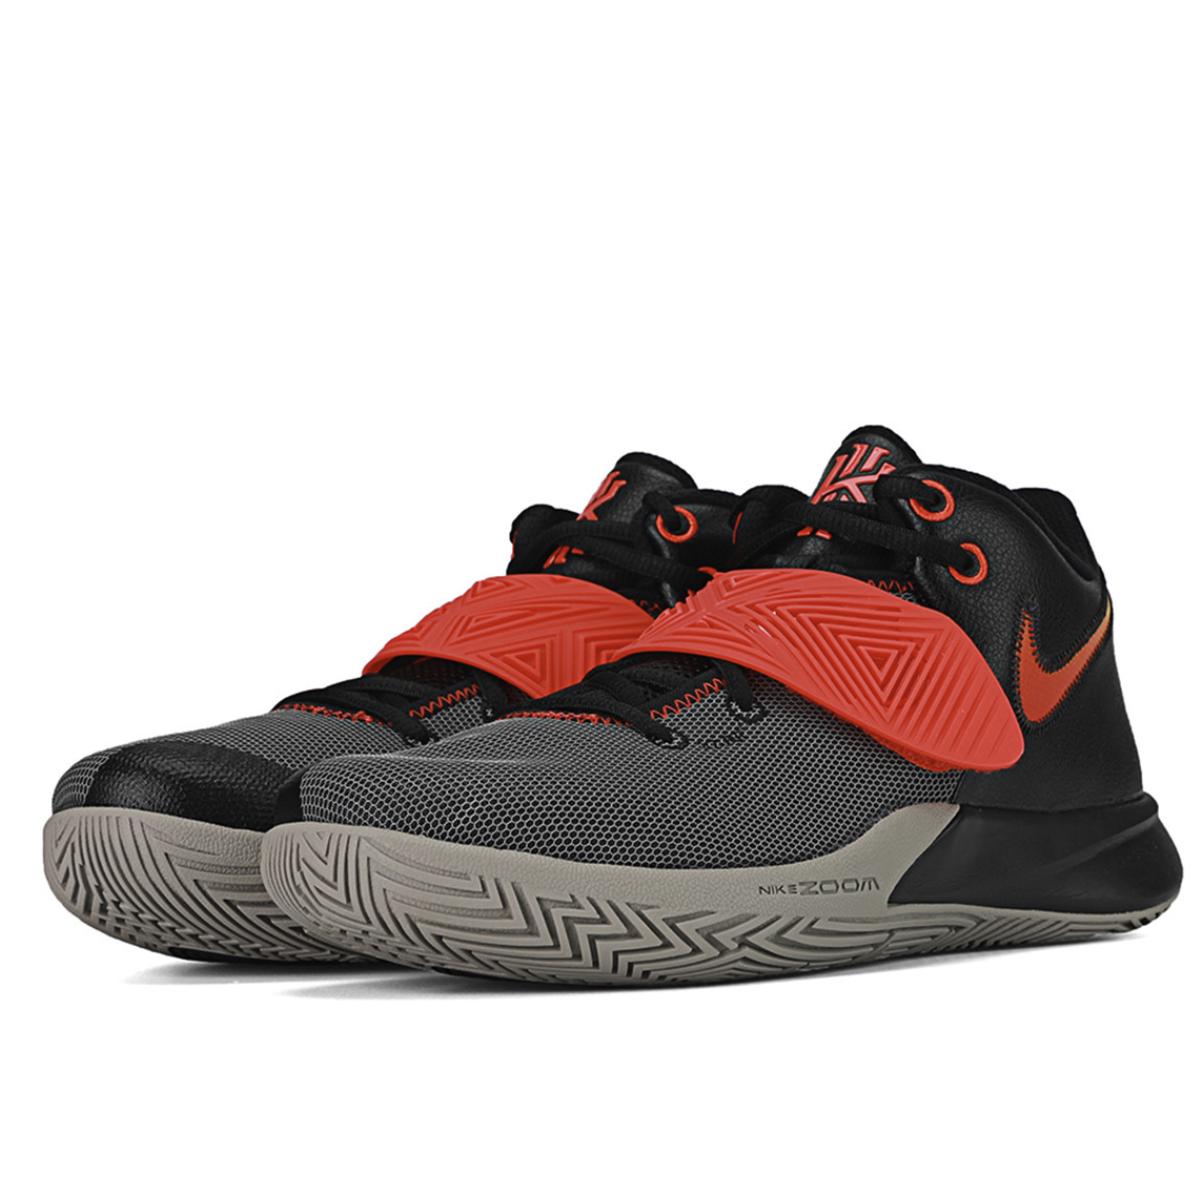 NIKE 耐克 KYRIE FLYTRAP III 男士篮球鞋